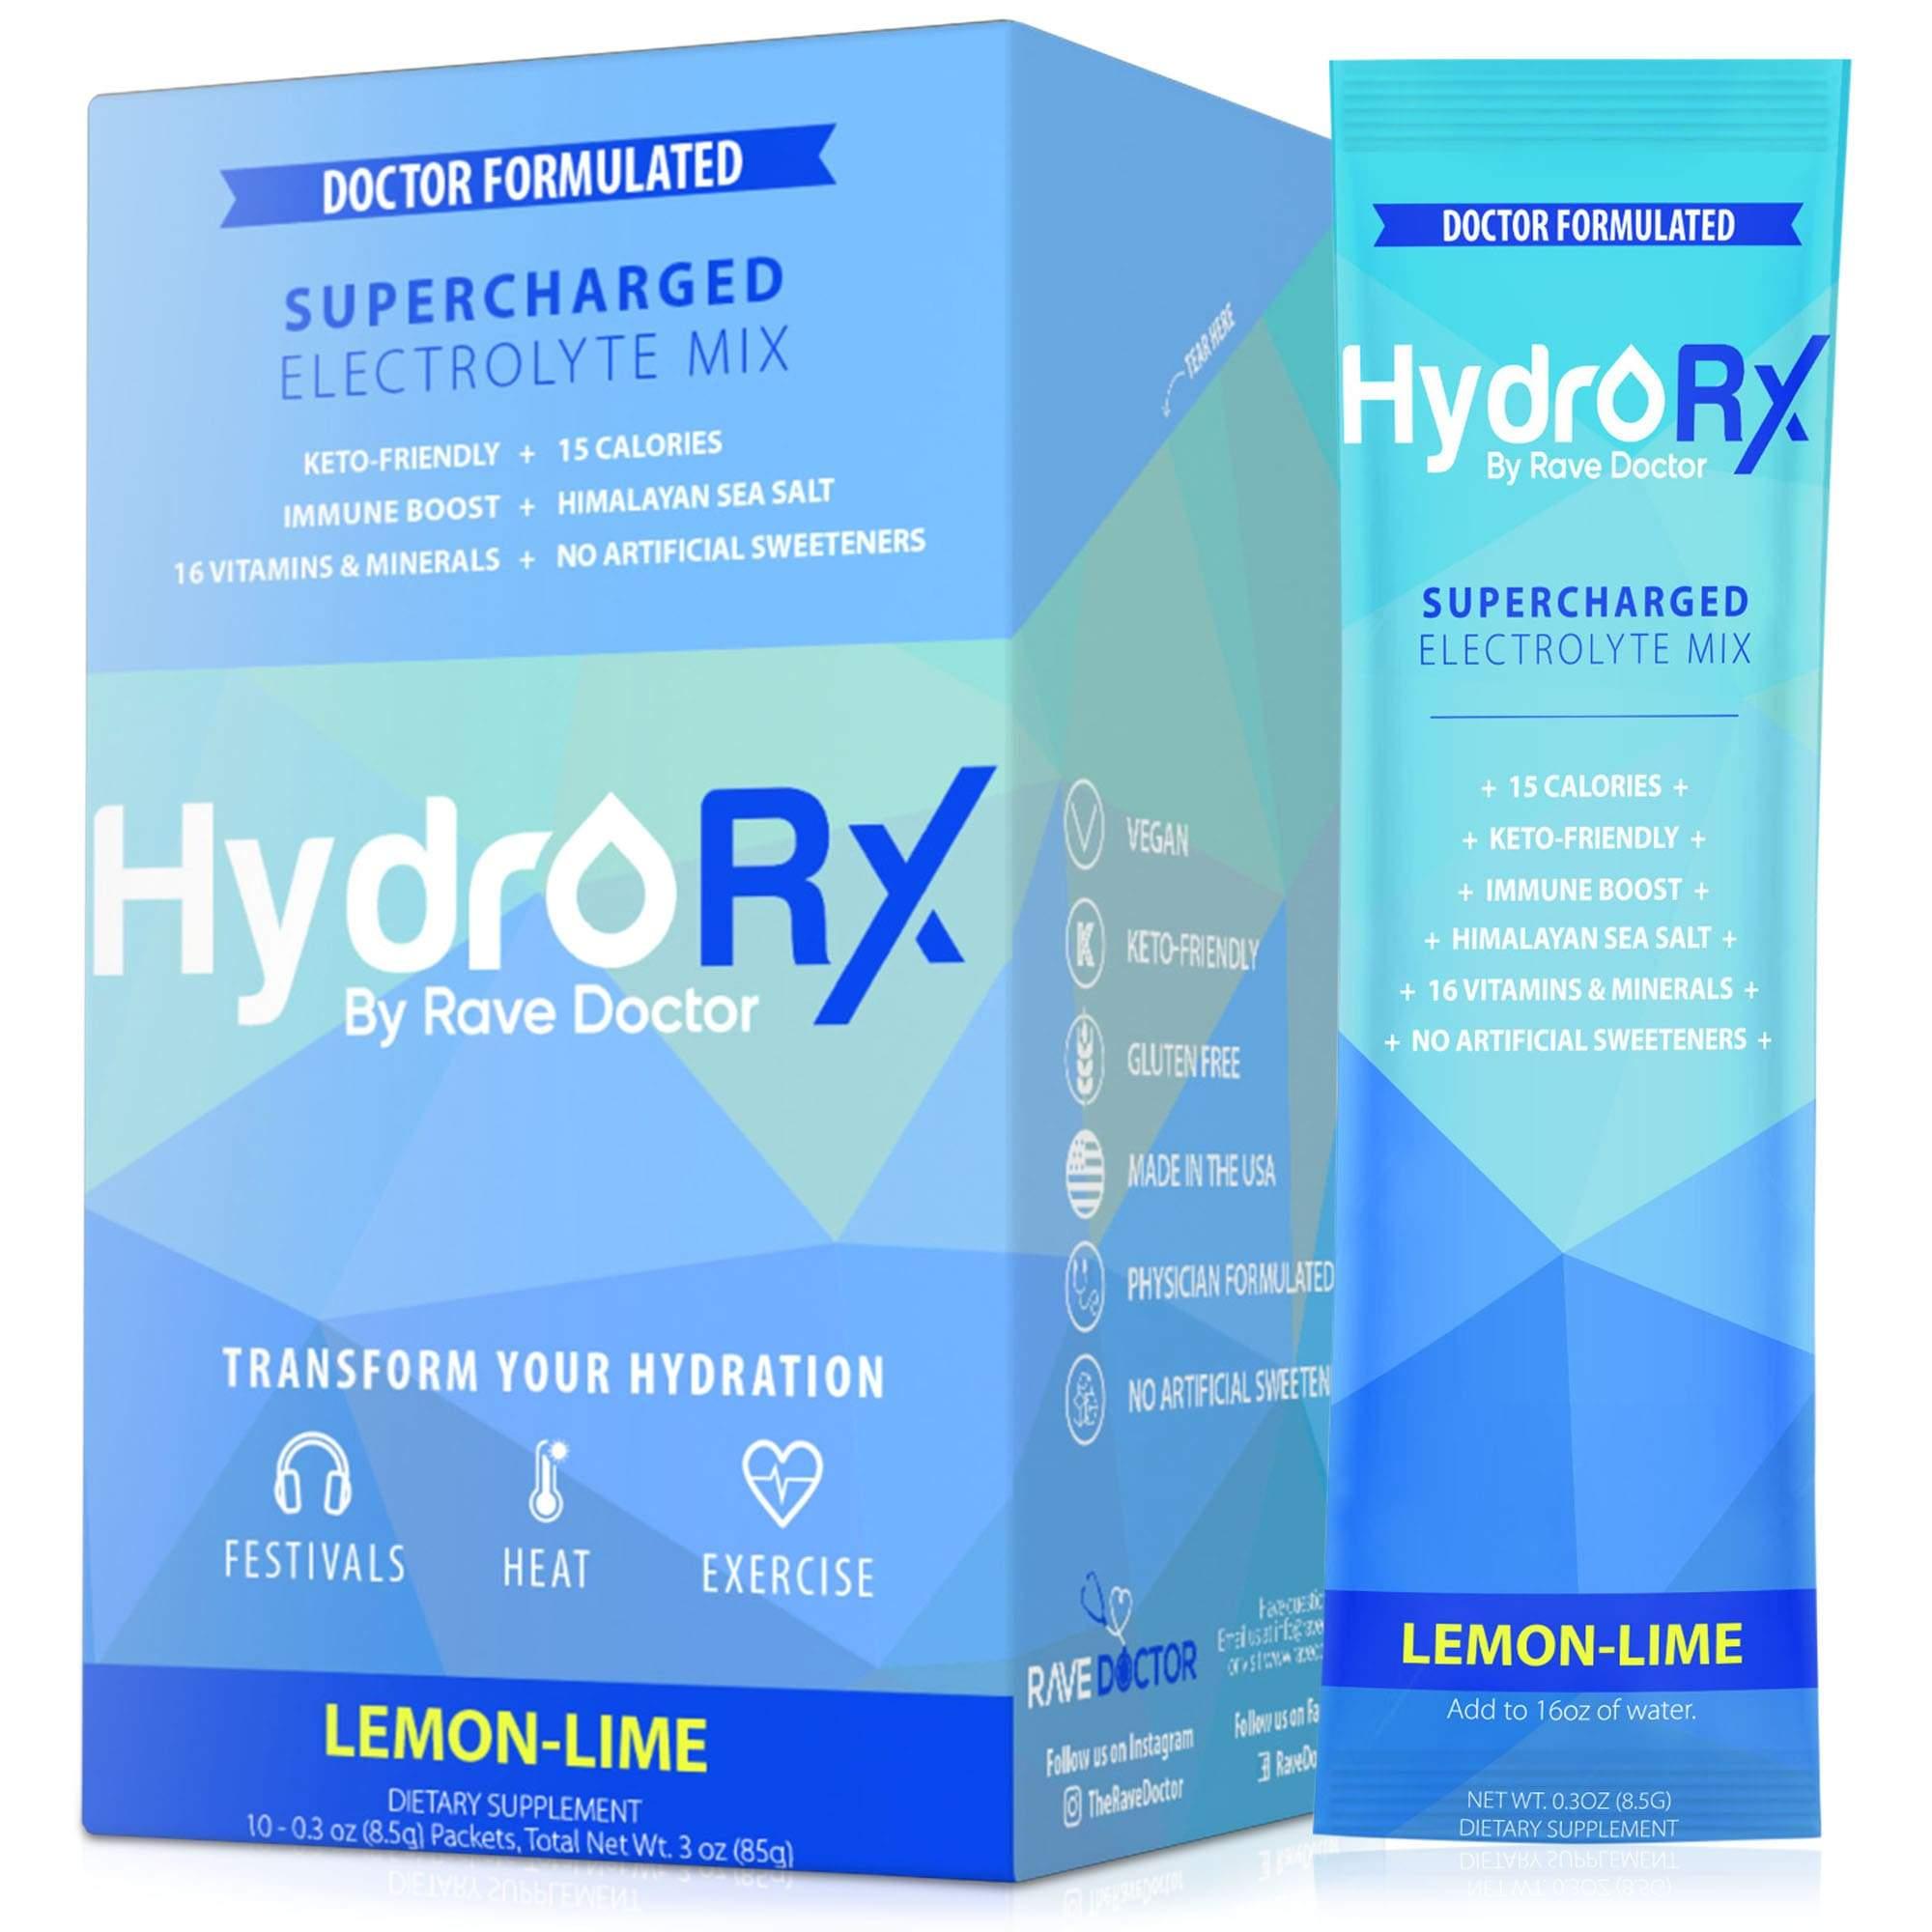 HydroRX